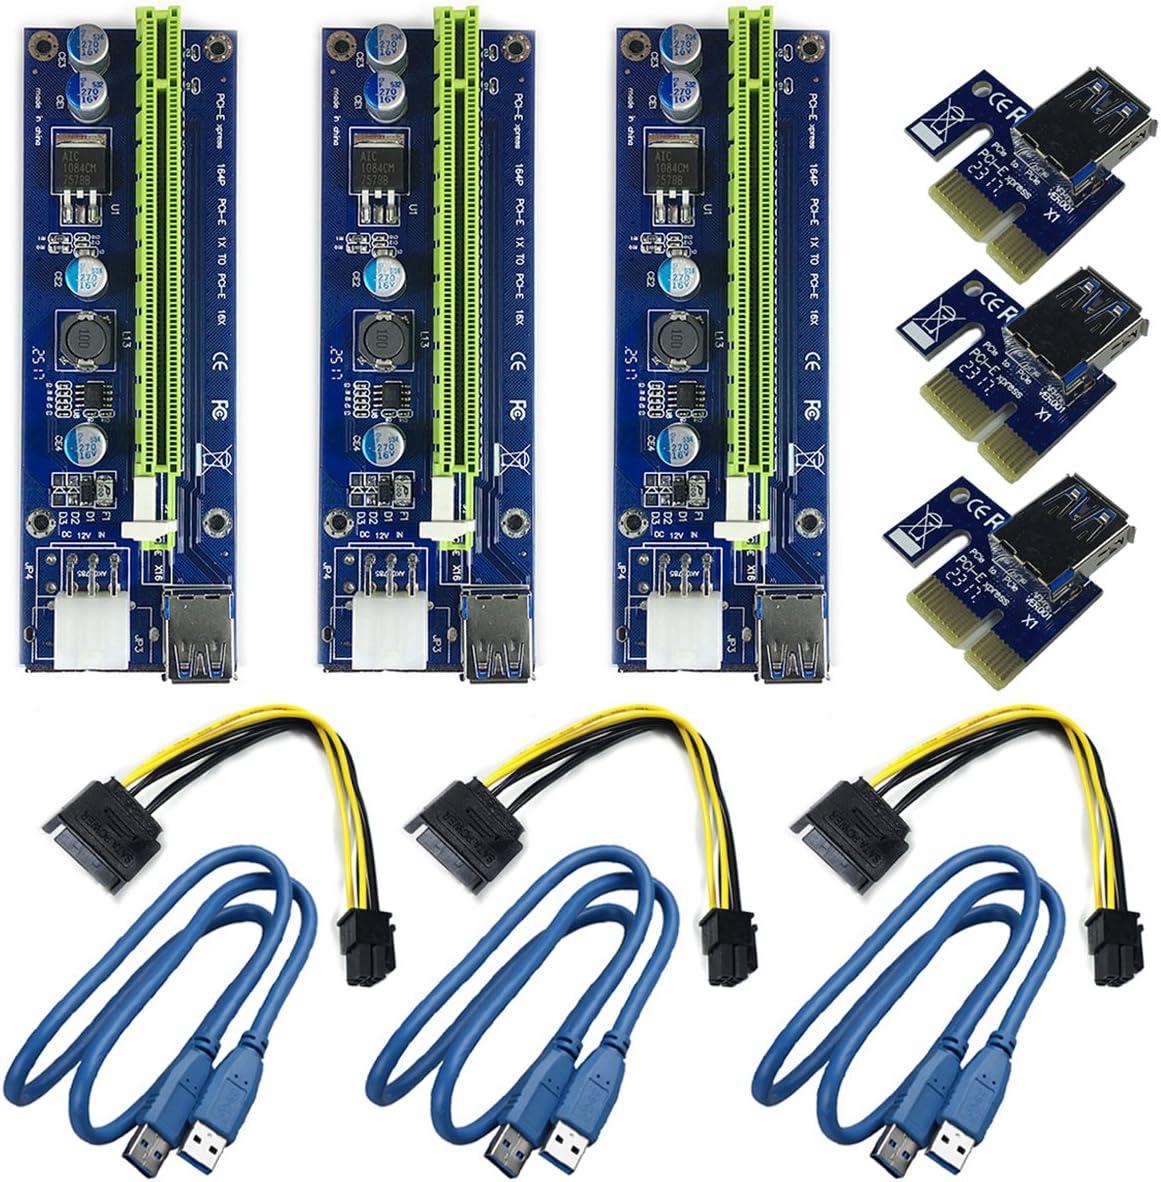 Multibao PCI-E 1x to 16x USB 3.0 GPU Extender Riser Adapter Card Cable Bitcoin Mining 6PIN Power